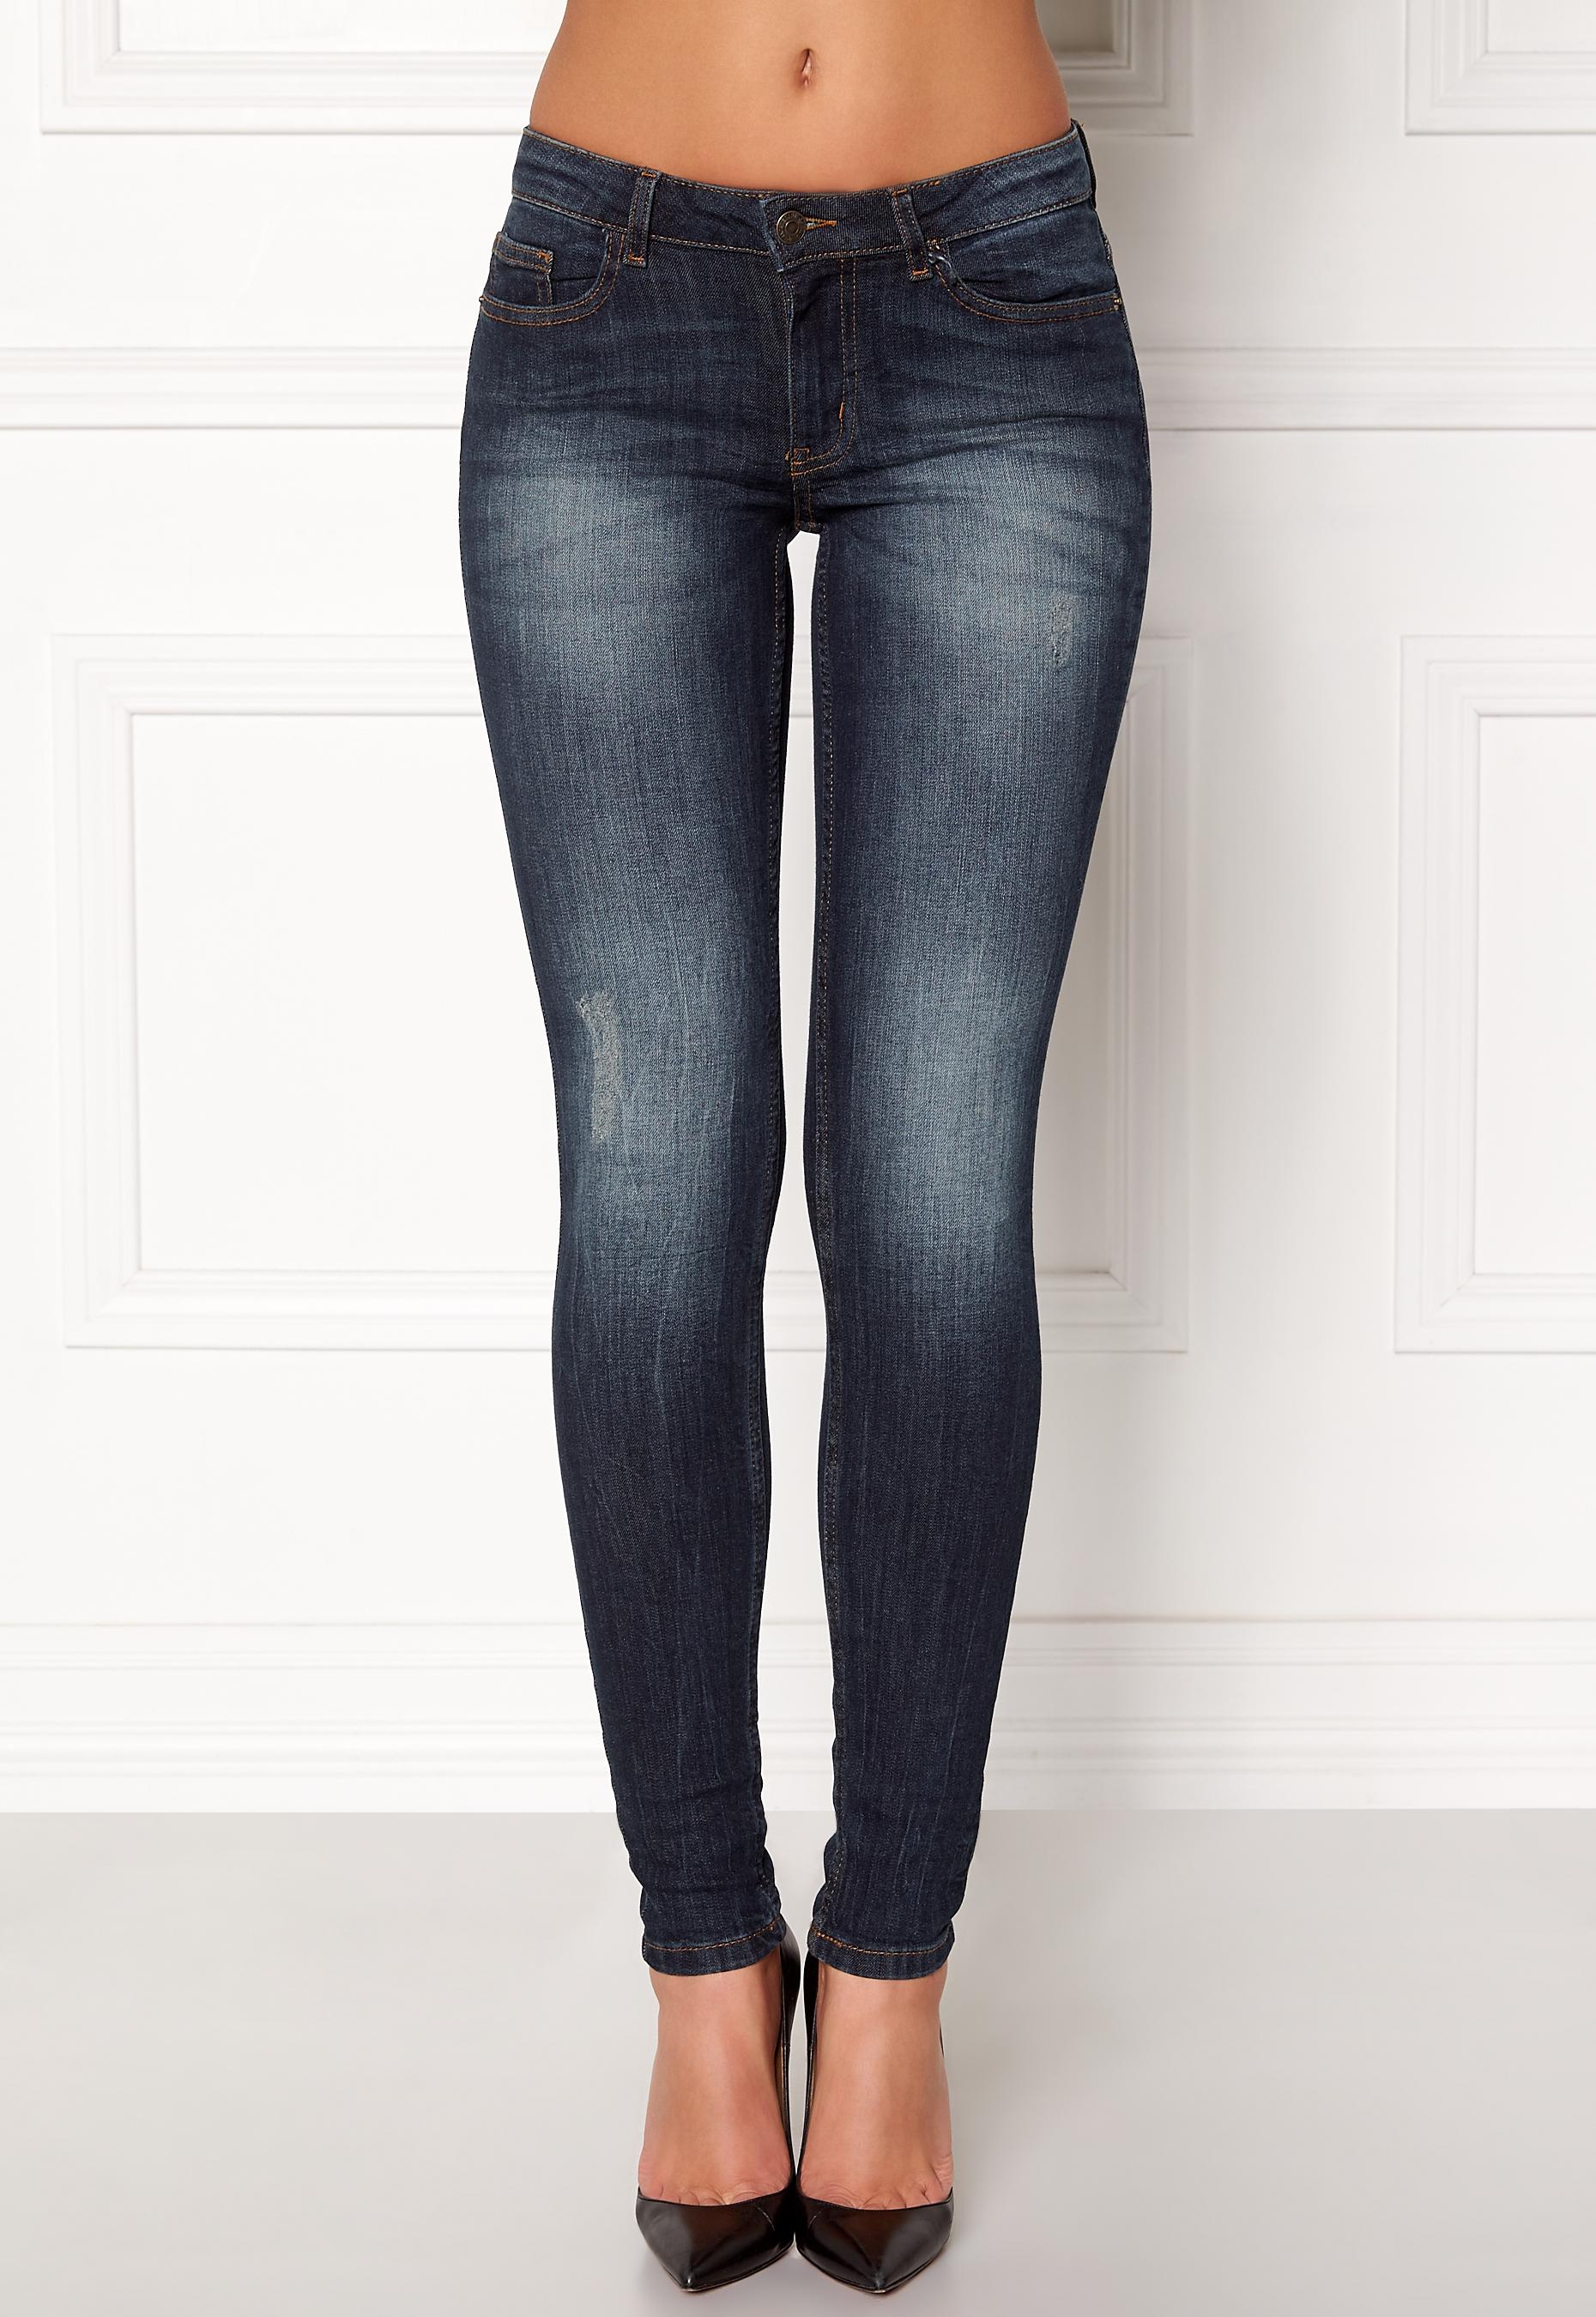 Skinny Jeans - Dark blue denim Jacqueline de Yong Nq5b4arw